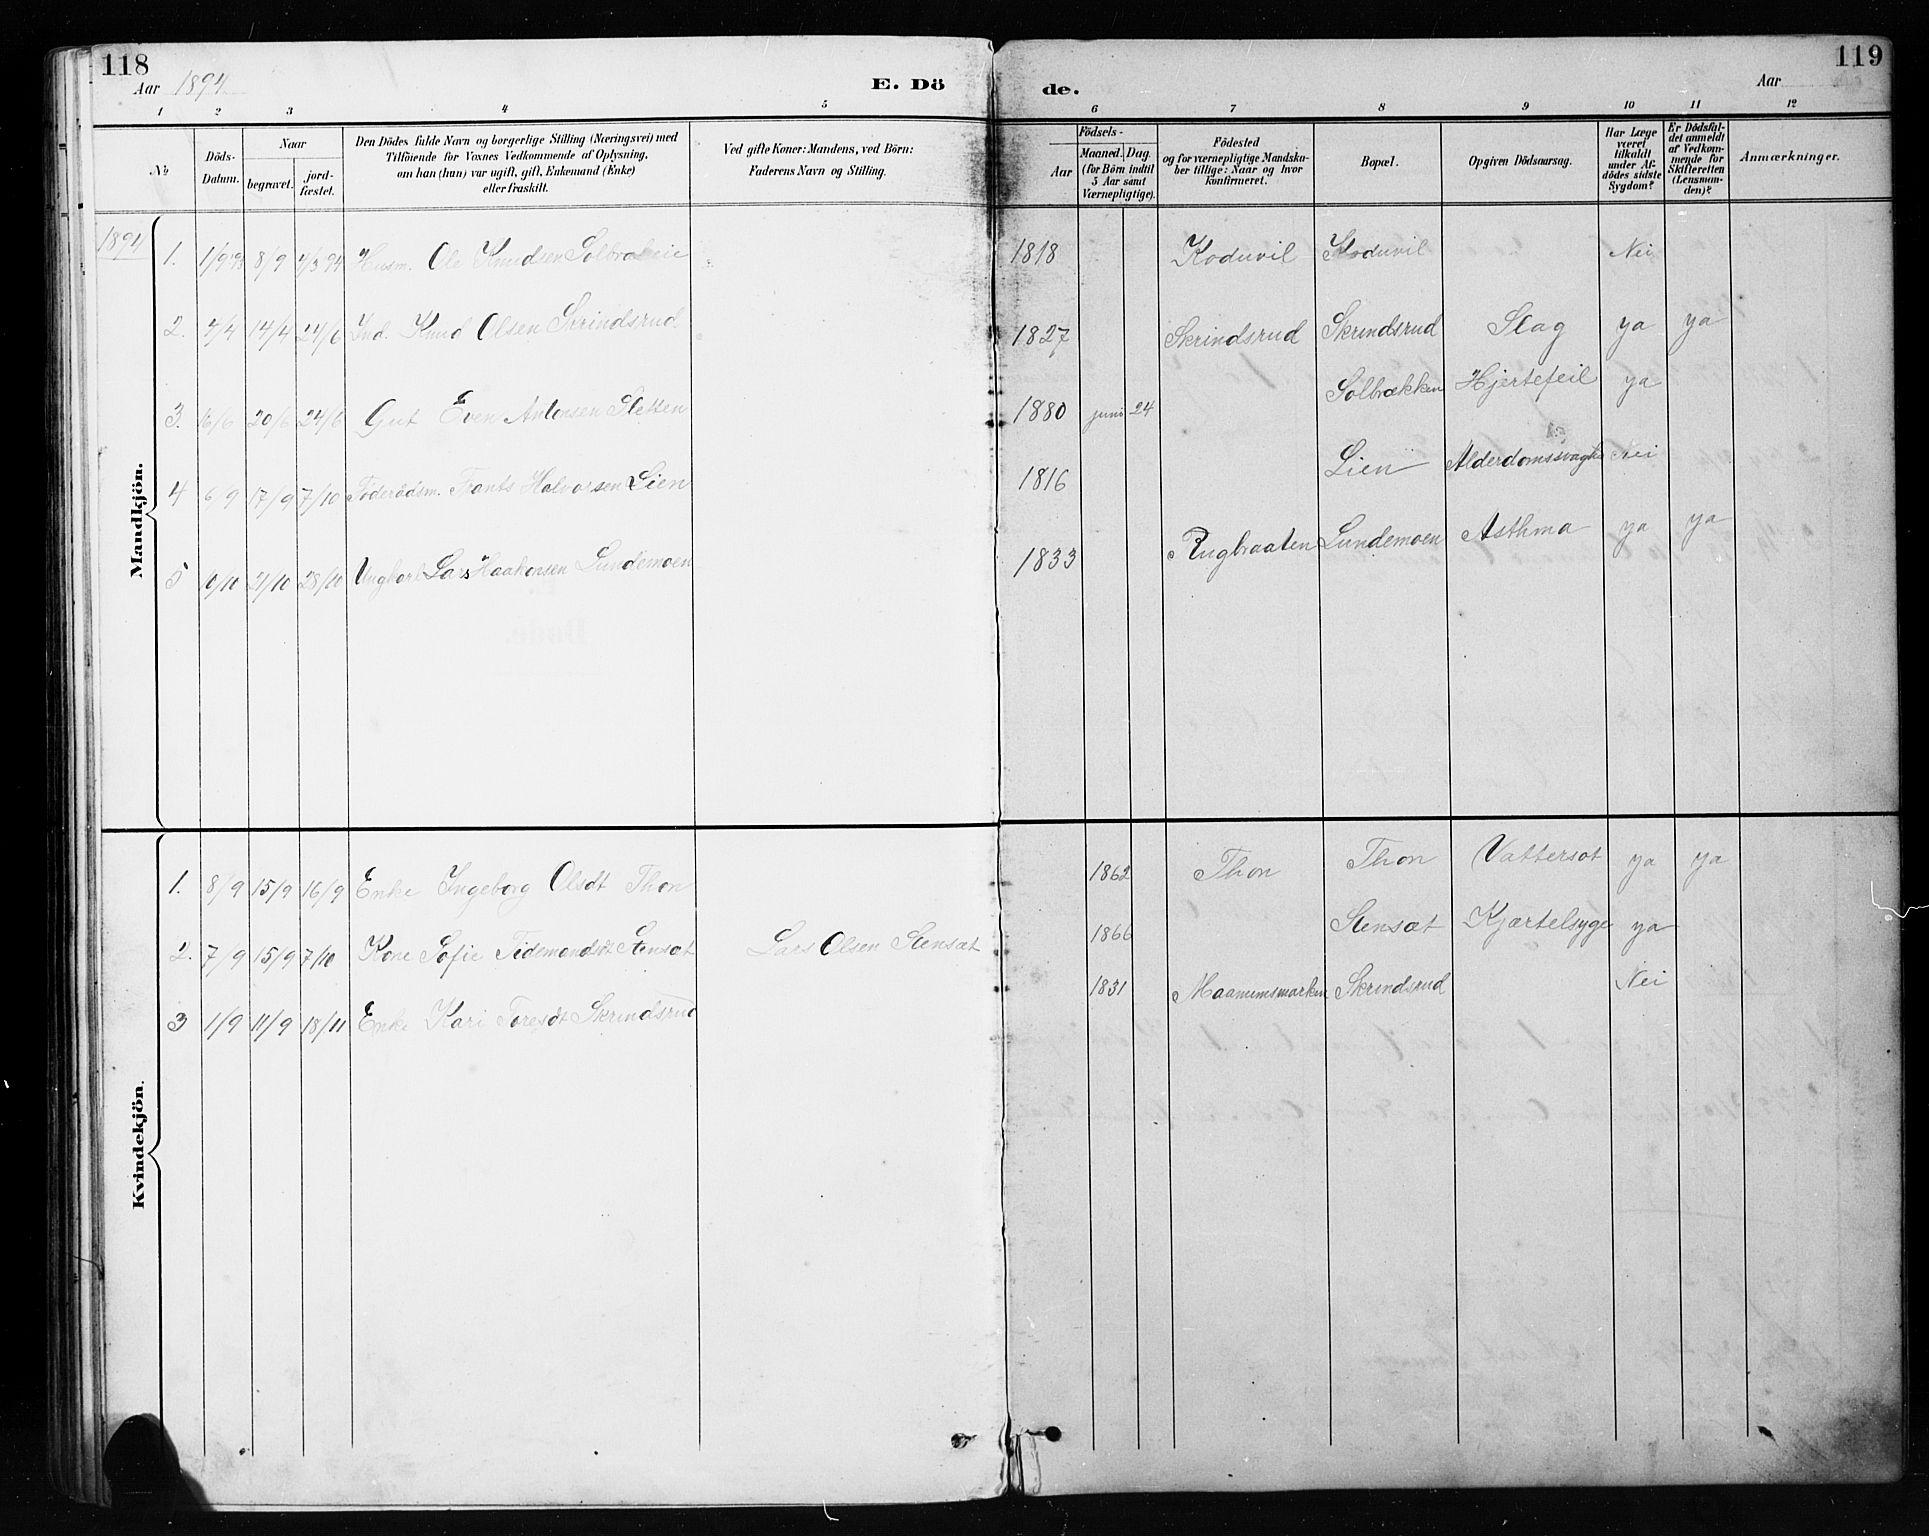 SAH, Etnedal prestekontor, H/Ha/Hab/Habb/L0001: Klokkerbok nr. II 1, 1894-1911, s. 118-119